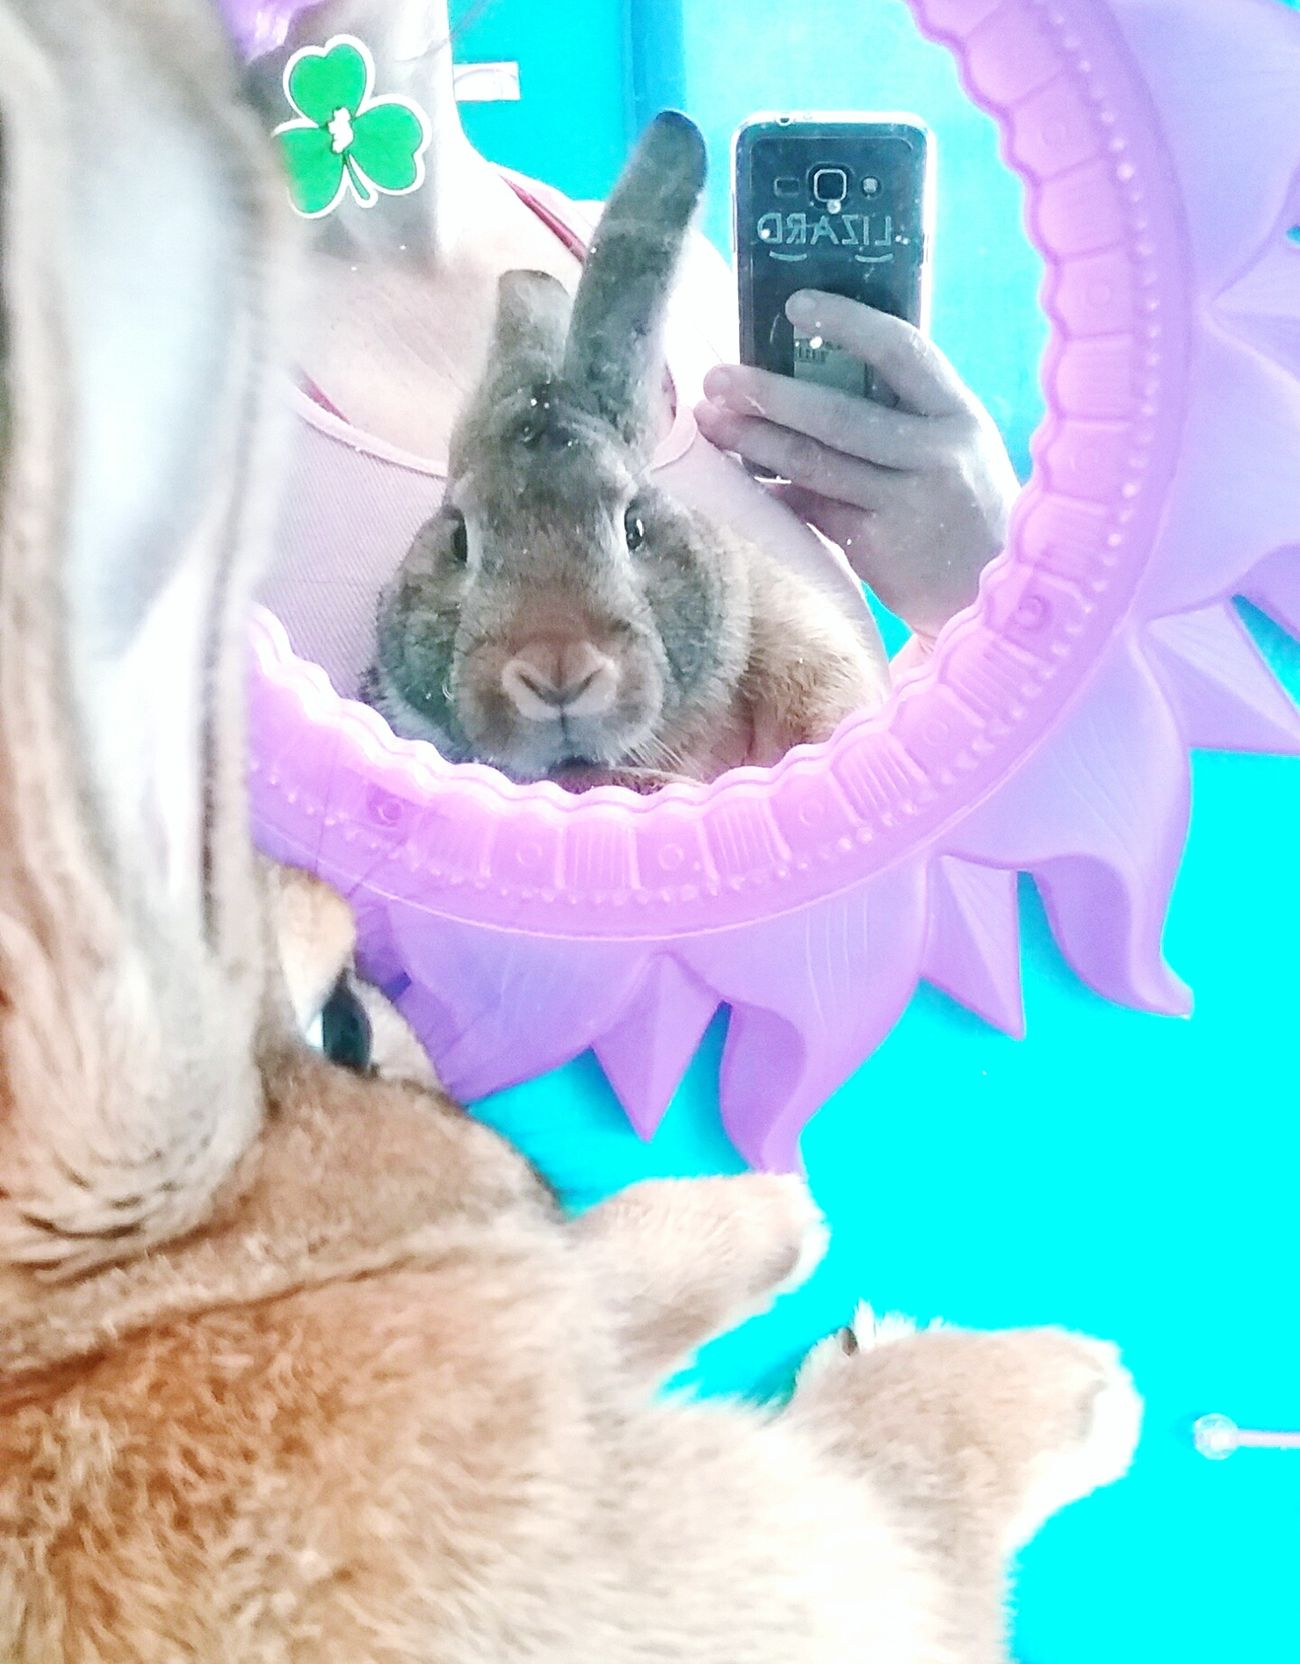 Pistol 6 months old😍🐇💚✊ Rabbits 🐇 Flemish Giant Rabbit ❤️ I Love My Rabbit 🐰💕